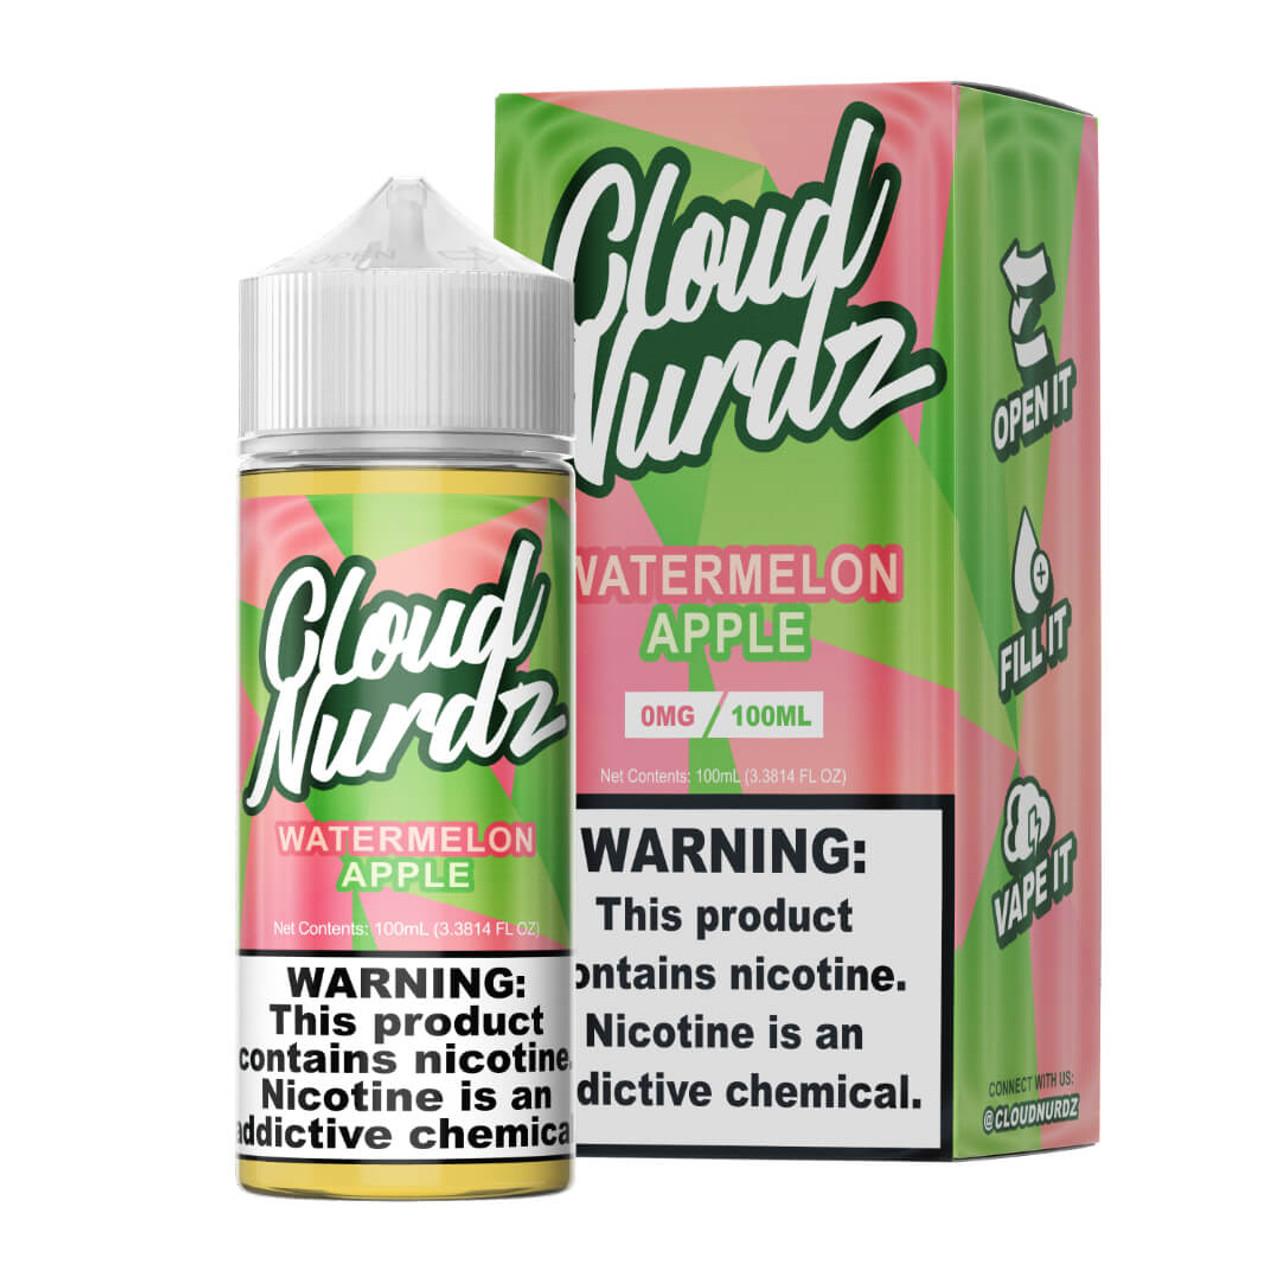 Cloud Nurdz Watermelon Apple 100ml E-Juice